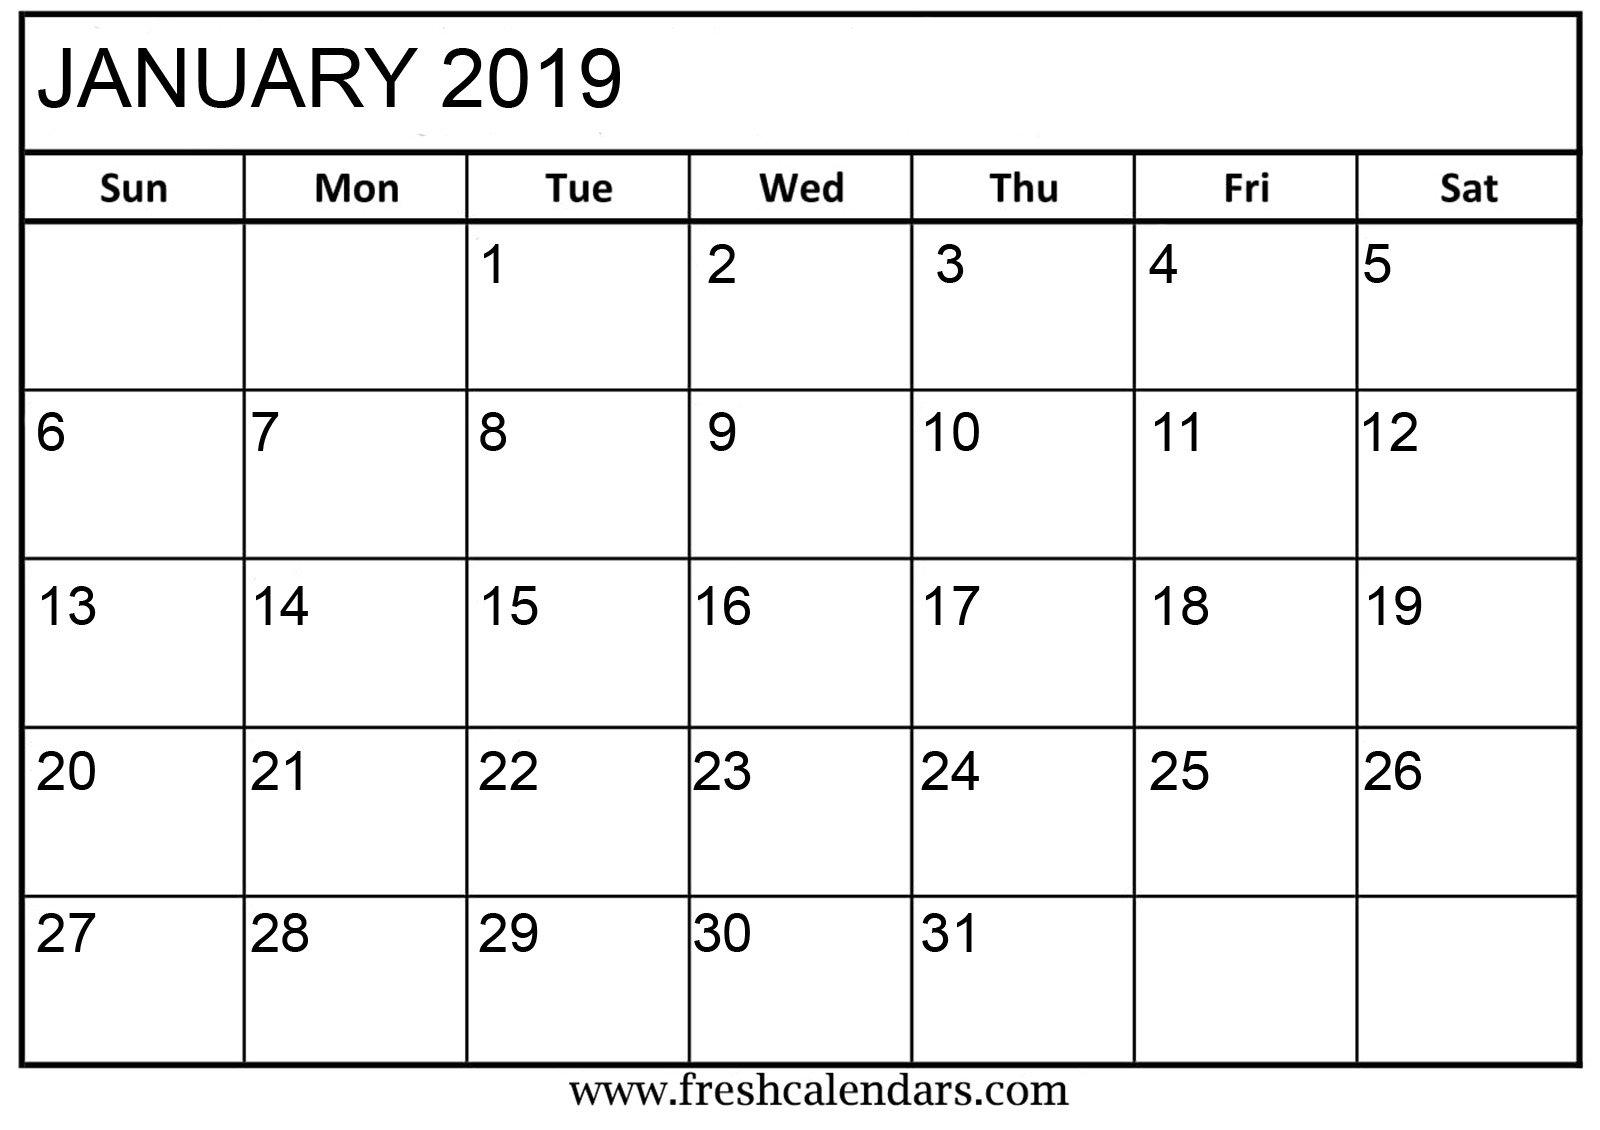 January 2019 Calendar Printable – Fresh Calendars Calendar 2019 January Printable